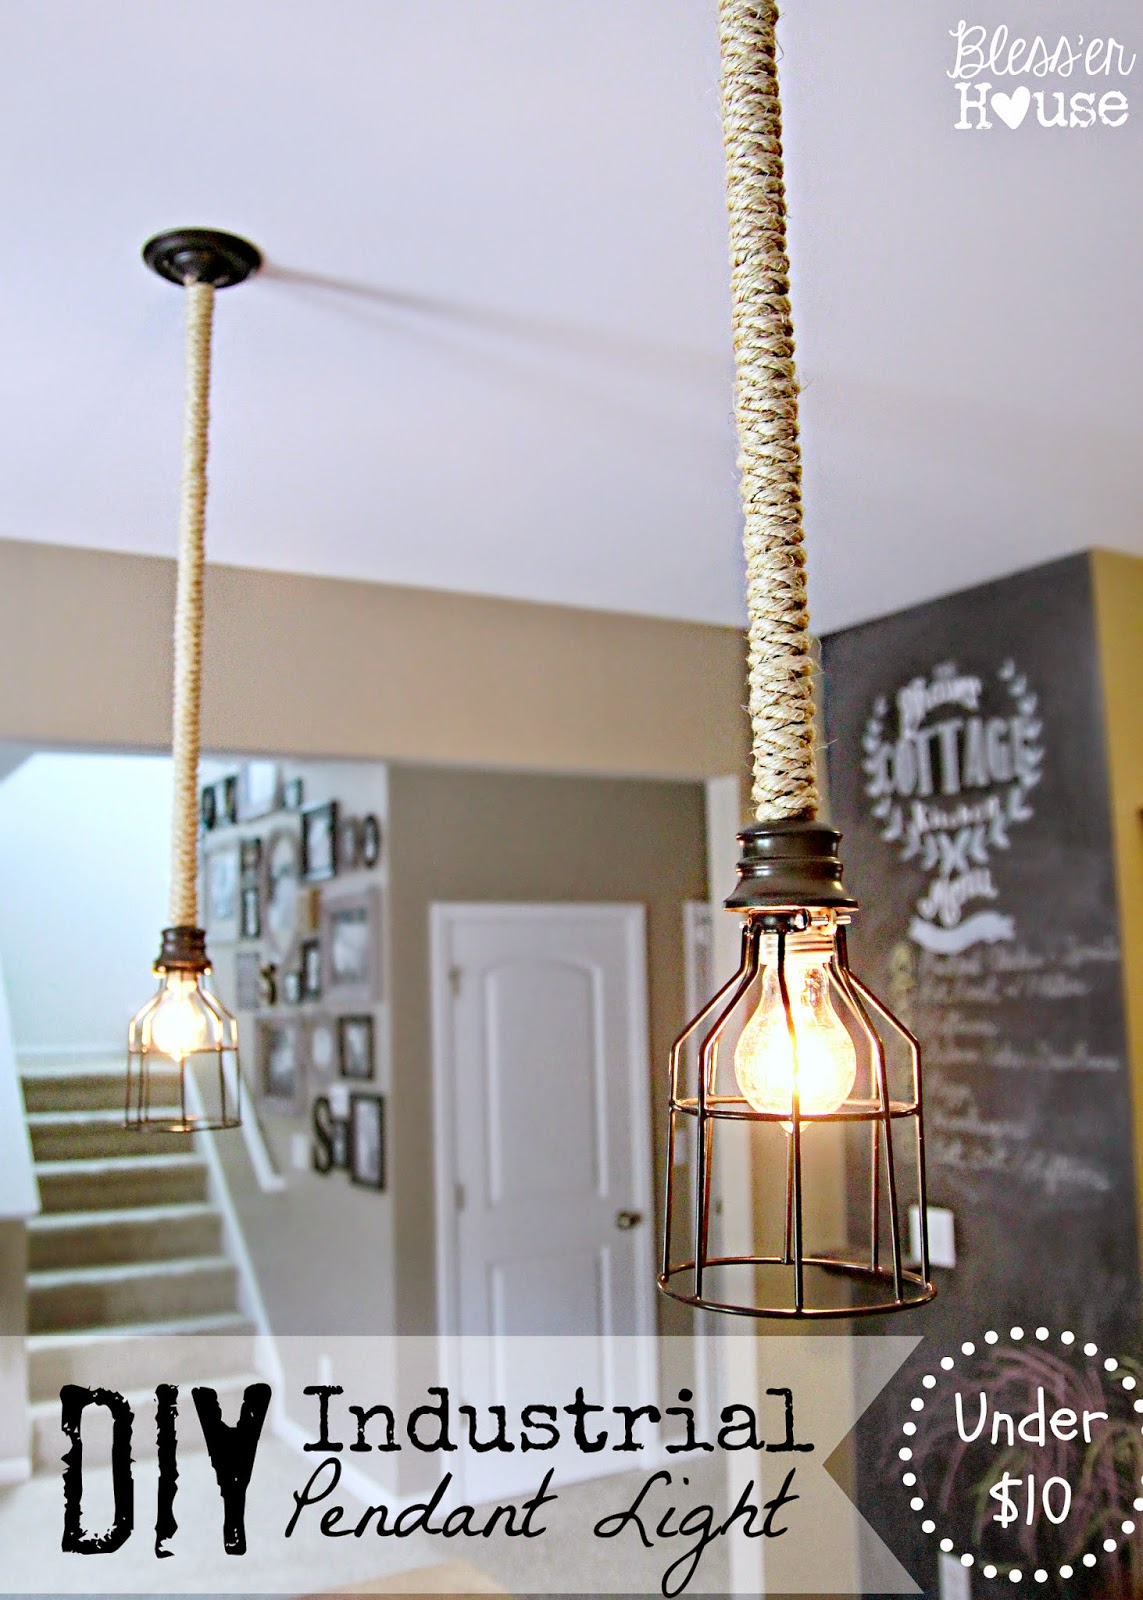 kitchen pendant light fixtures black flooring ideas diy industrial for under 10 bless er house